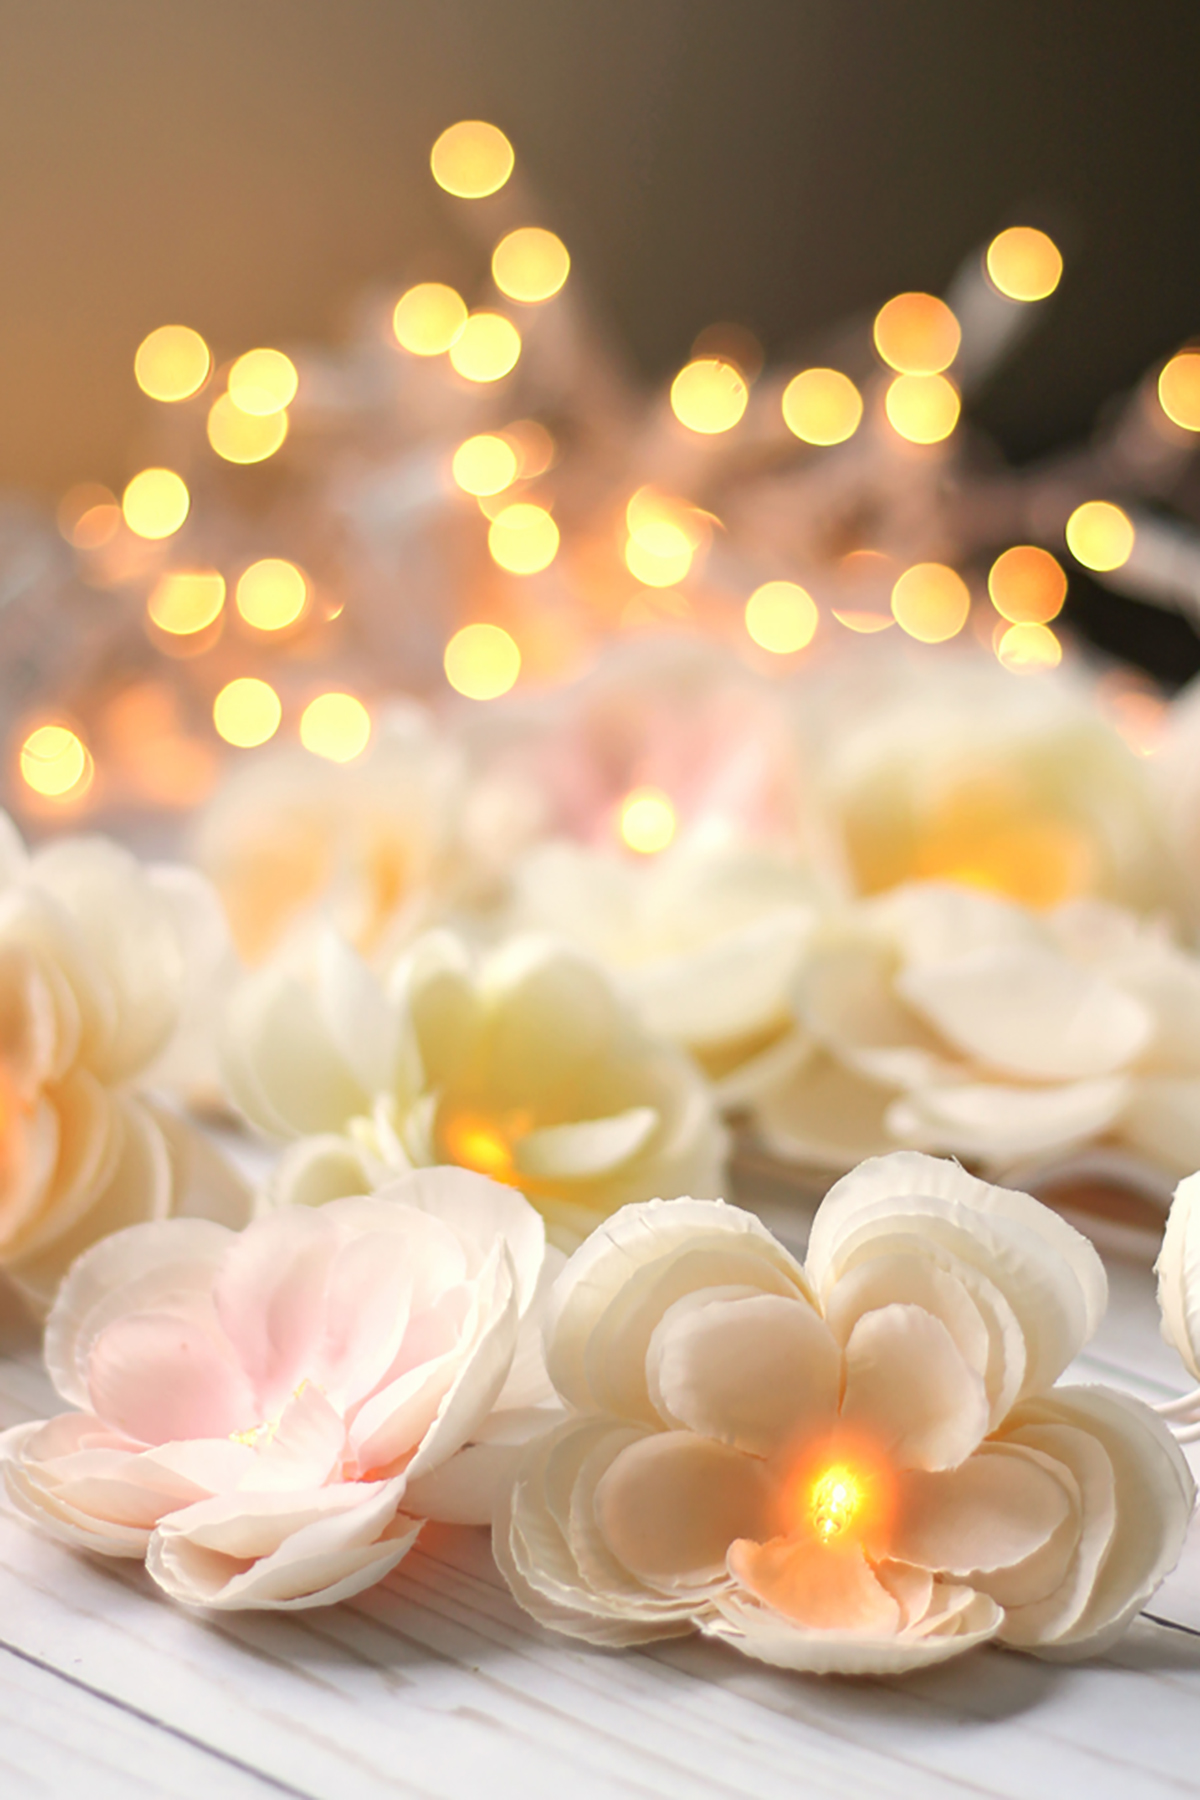 Fake flowers for crafts - Fake Flowers For Crafts 23